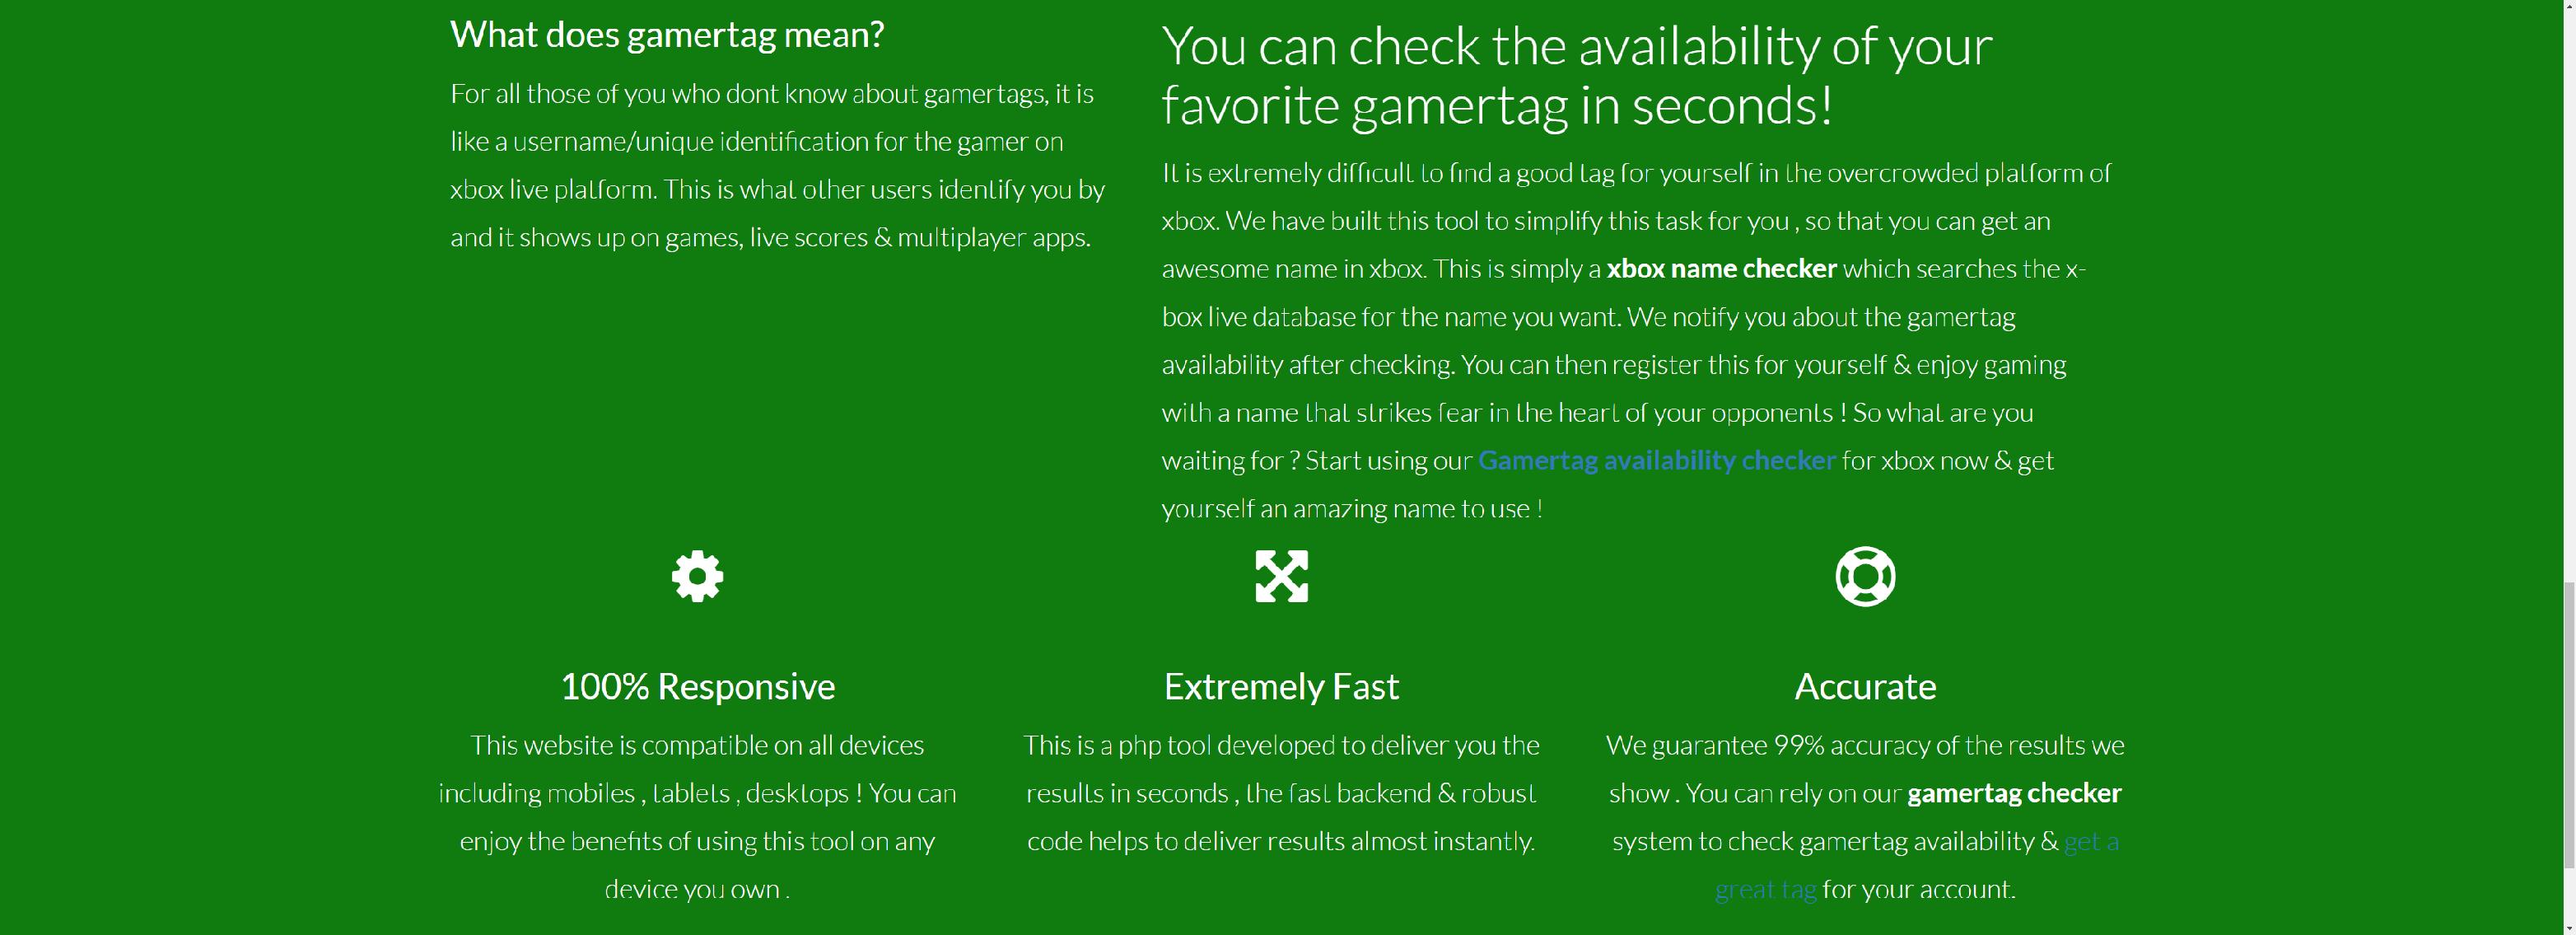 Free Xbox Gamertag Generator 6 Popular Tools 2020 Cllax Top Of It